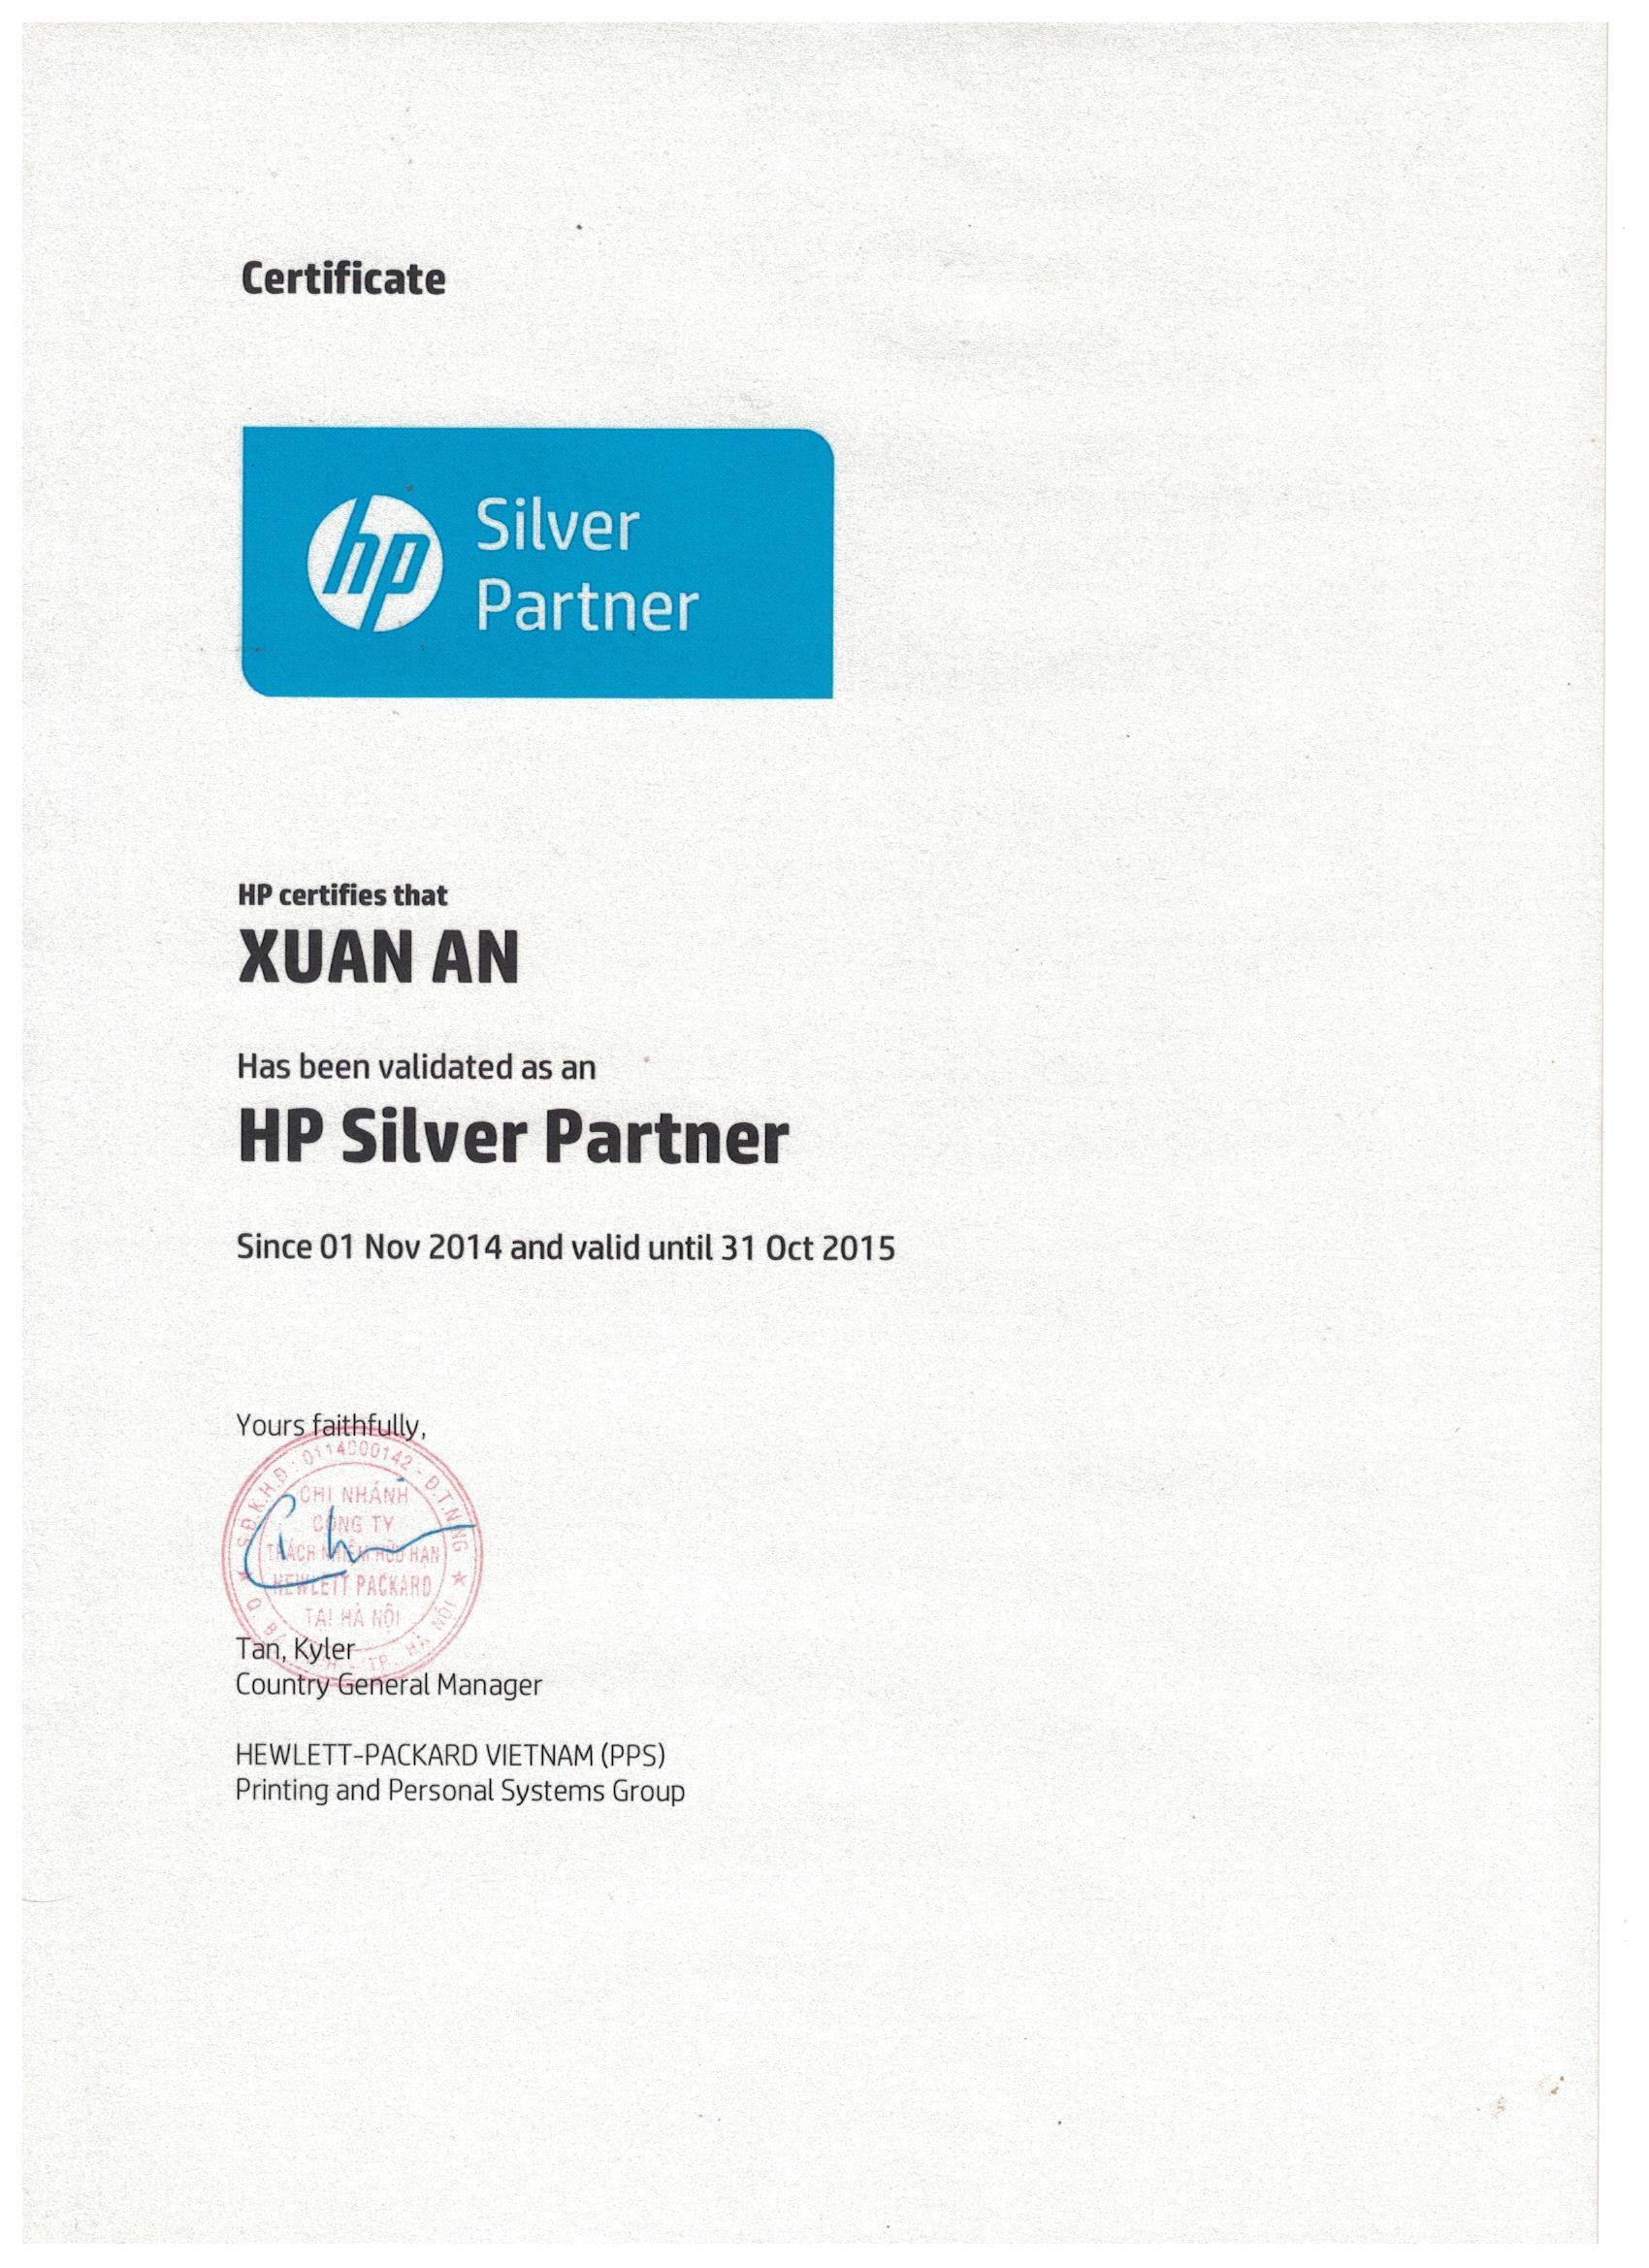 HP Probook 430 G6 - 6UX78PA (Silver)